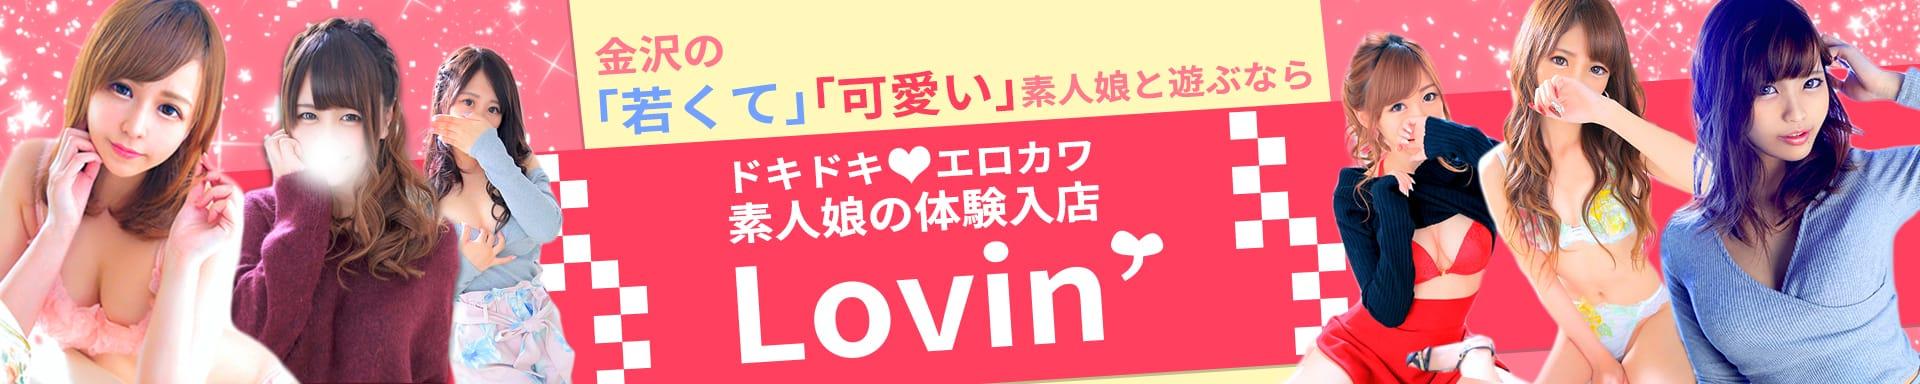 Lovin'(ラヴィン)~ドキドキ♡エロカワ素人娘の体験入店